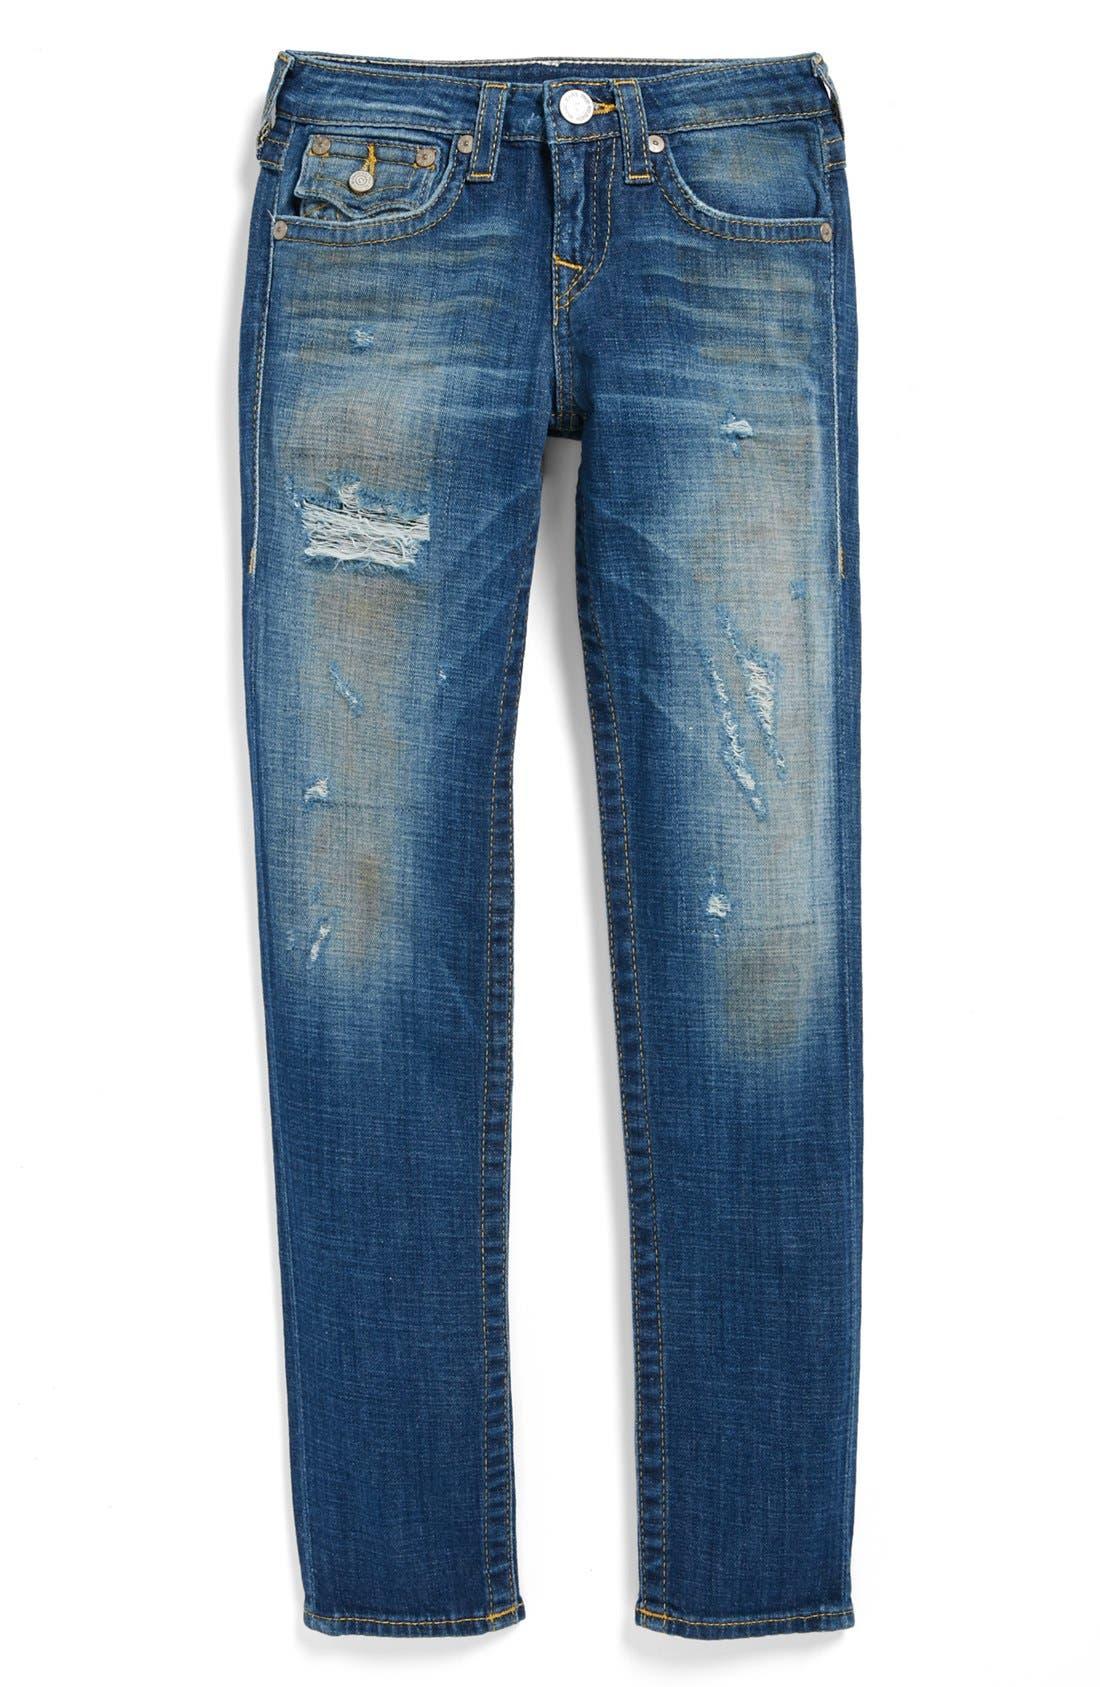 Alternate Image 2  - True Religion Brand Jeans 'Julie' Straight Leg Jeans (Big Girls)